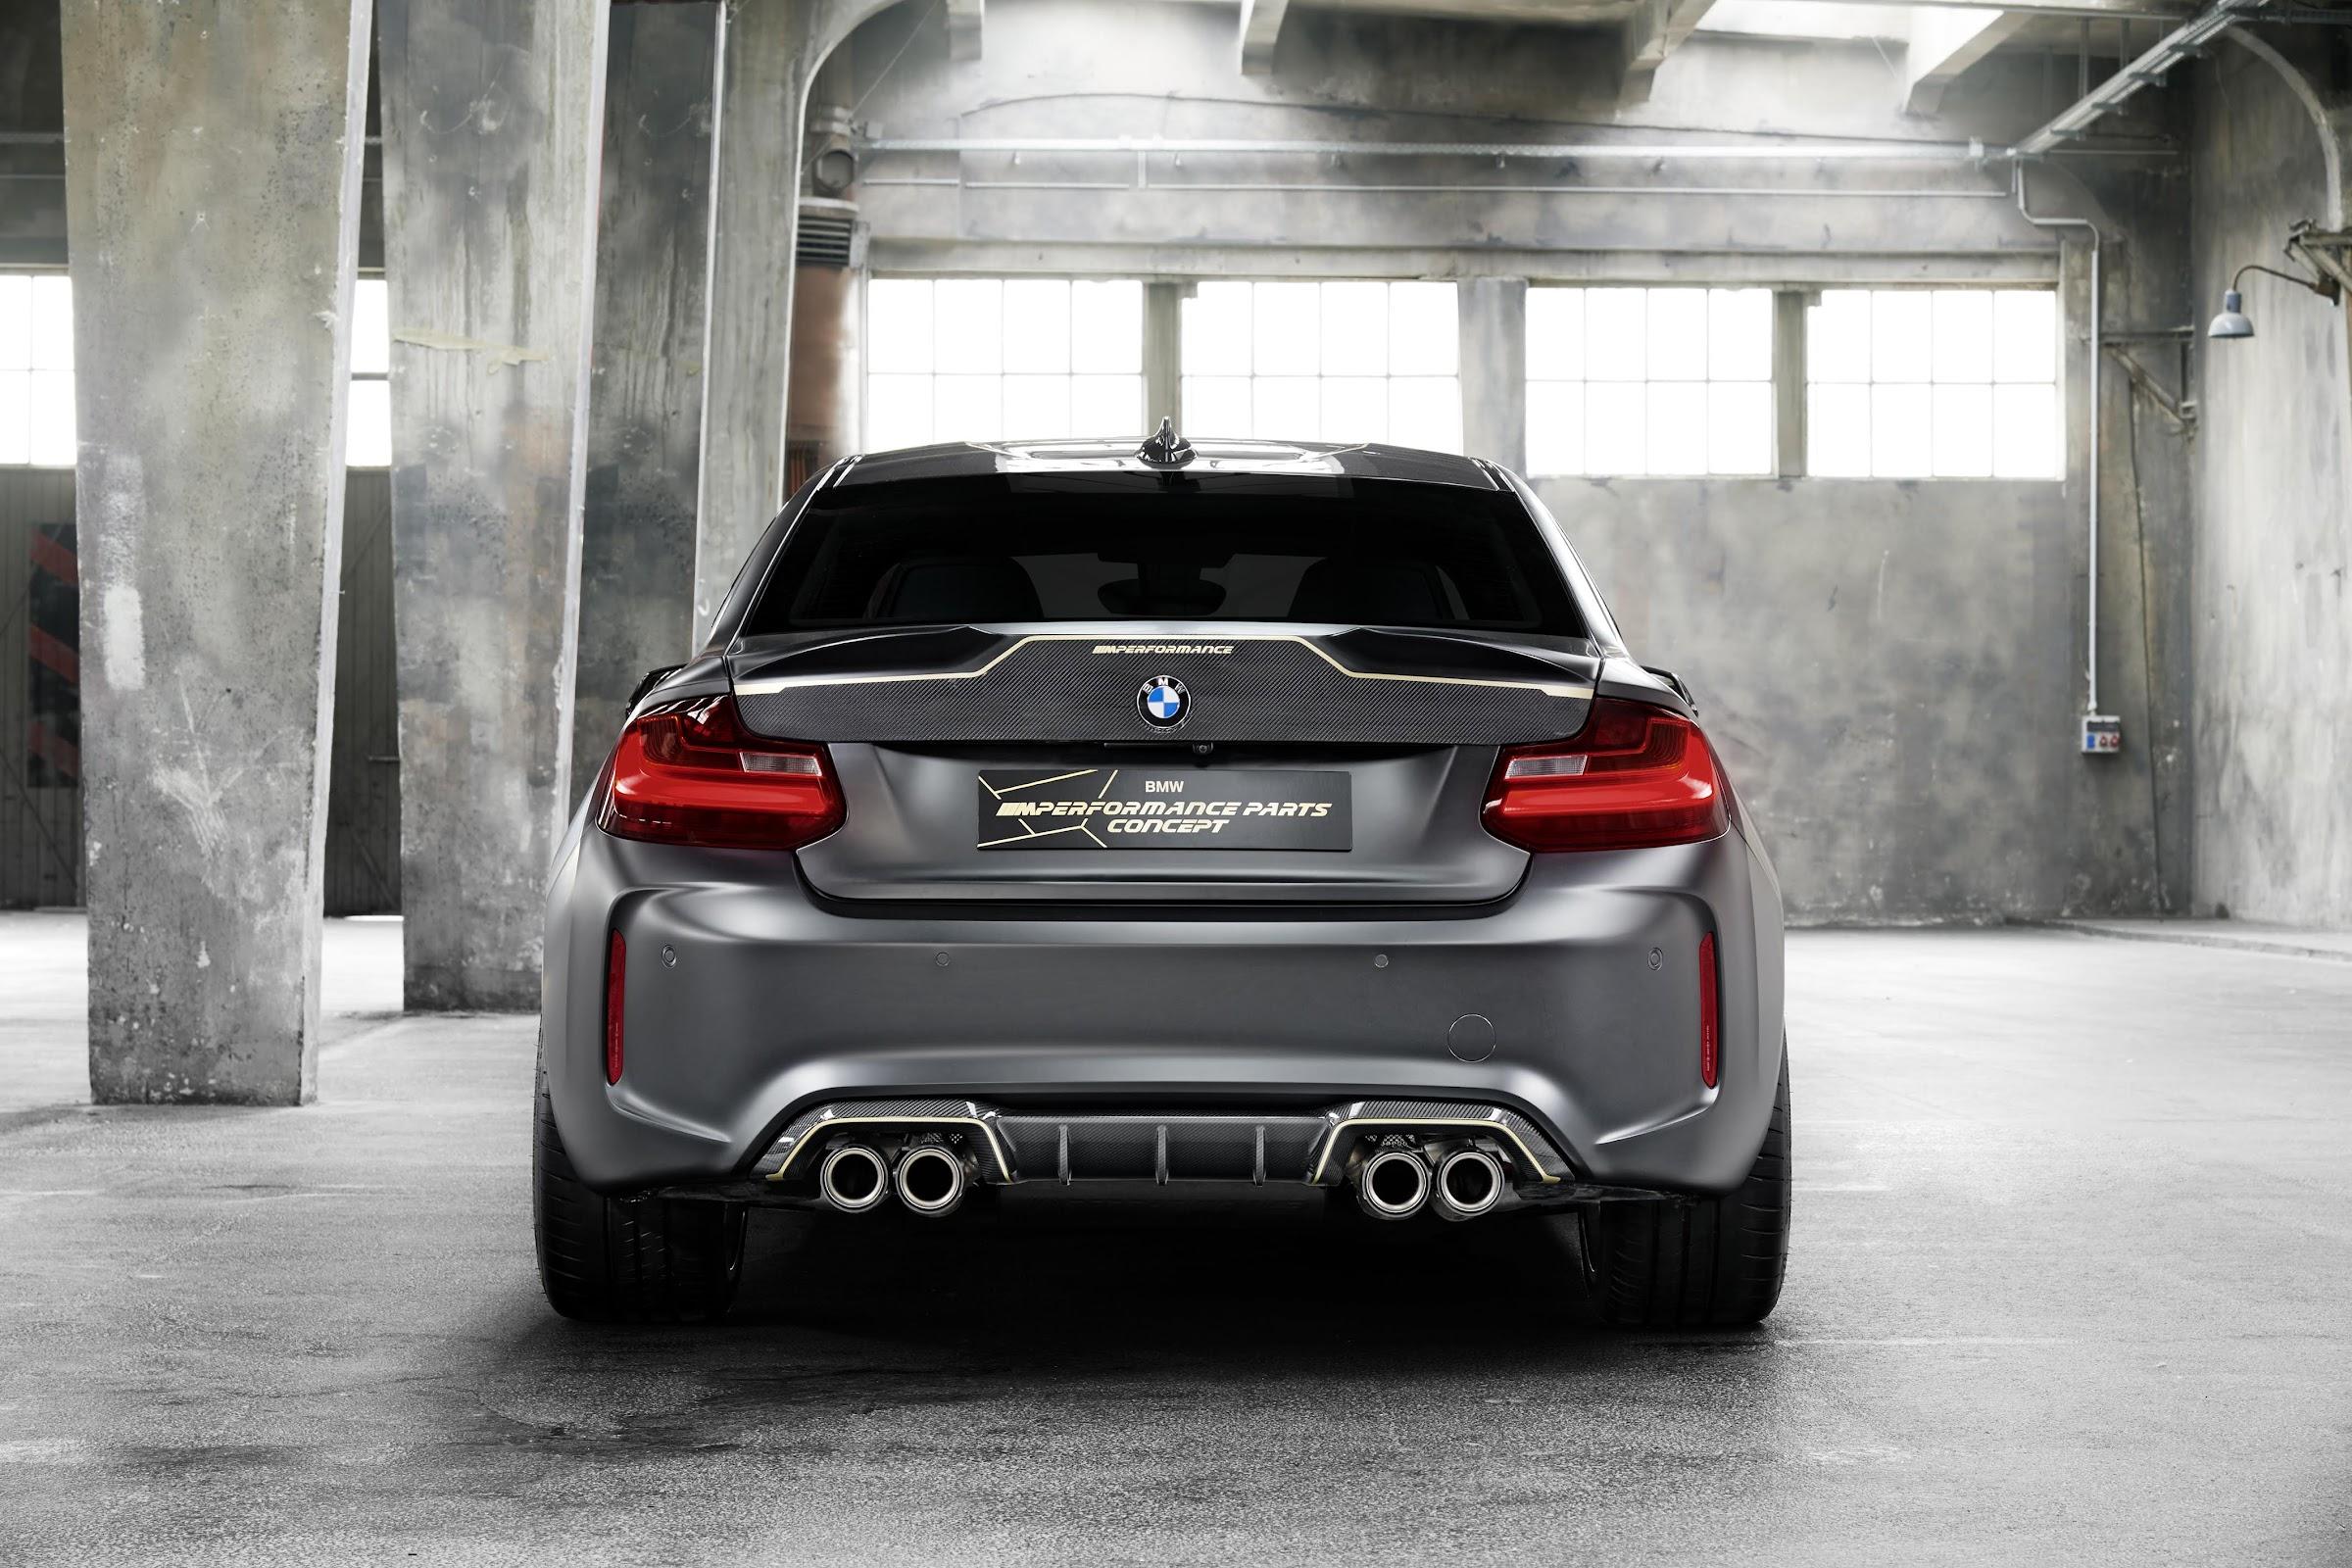 5nFaMwXlhKgv SYoH889jbTyu1 BVxjIbSgmaKlyeV2iAxJooHUjDHvBw6rFhBzTK1q06poFUmsnezmBnvEwwDTYCD1pZy36nncOxzVdvAuSv8q4PK64e3aUoDkFC48pANj4Qsp8Vg=w2400 - Nuevo BMW M Performance Parts Concept